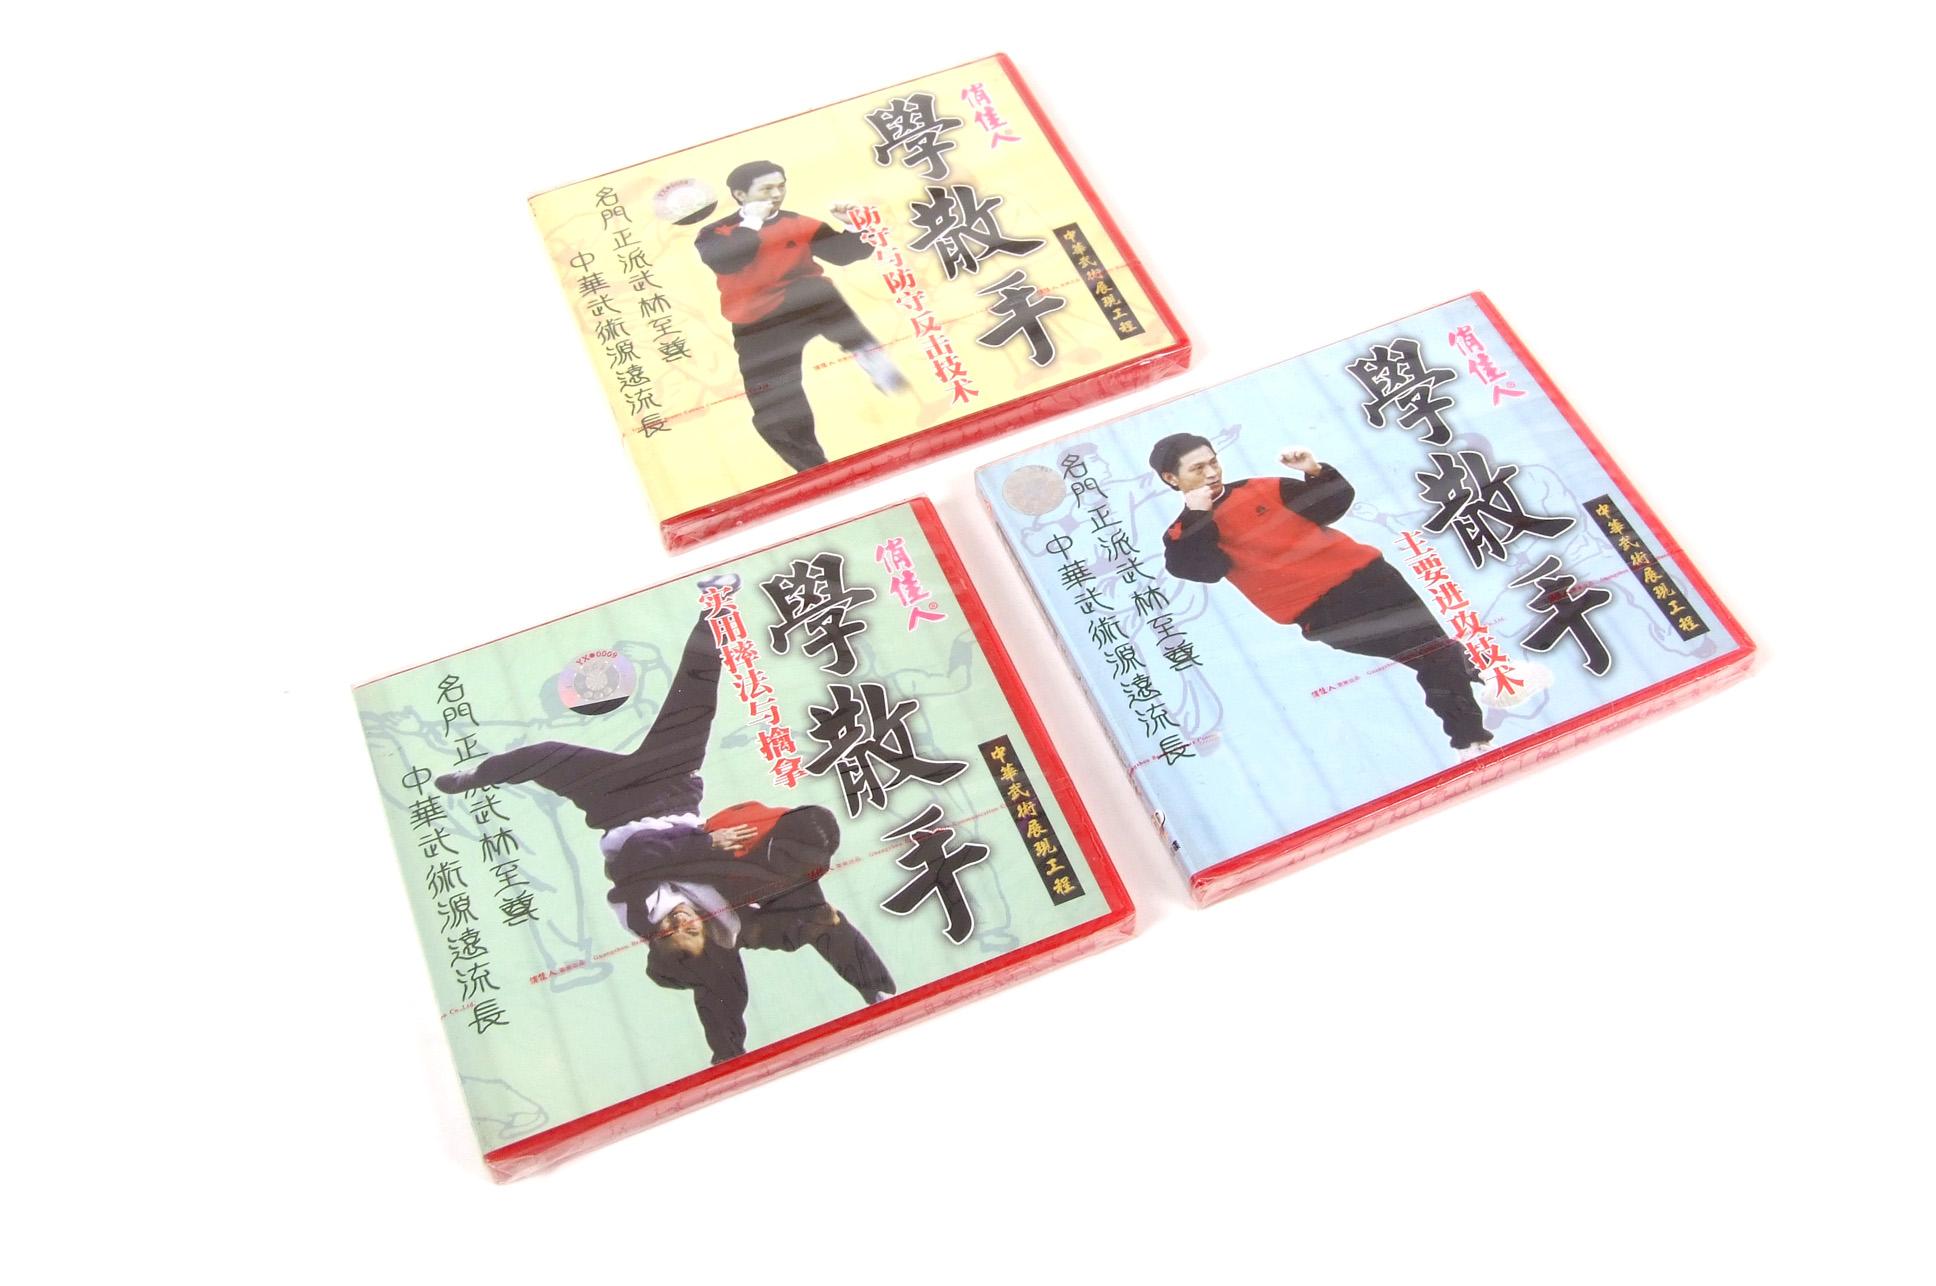 [VCD] Éducatif Sanda (San Shou)